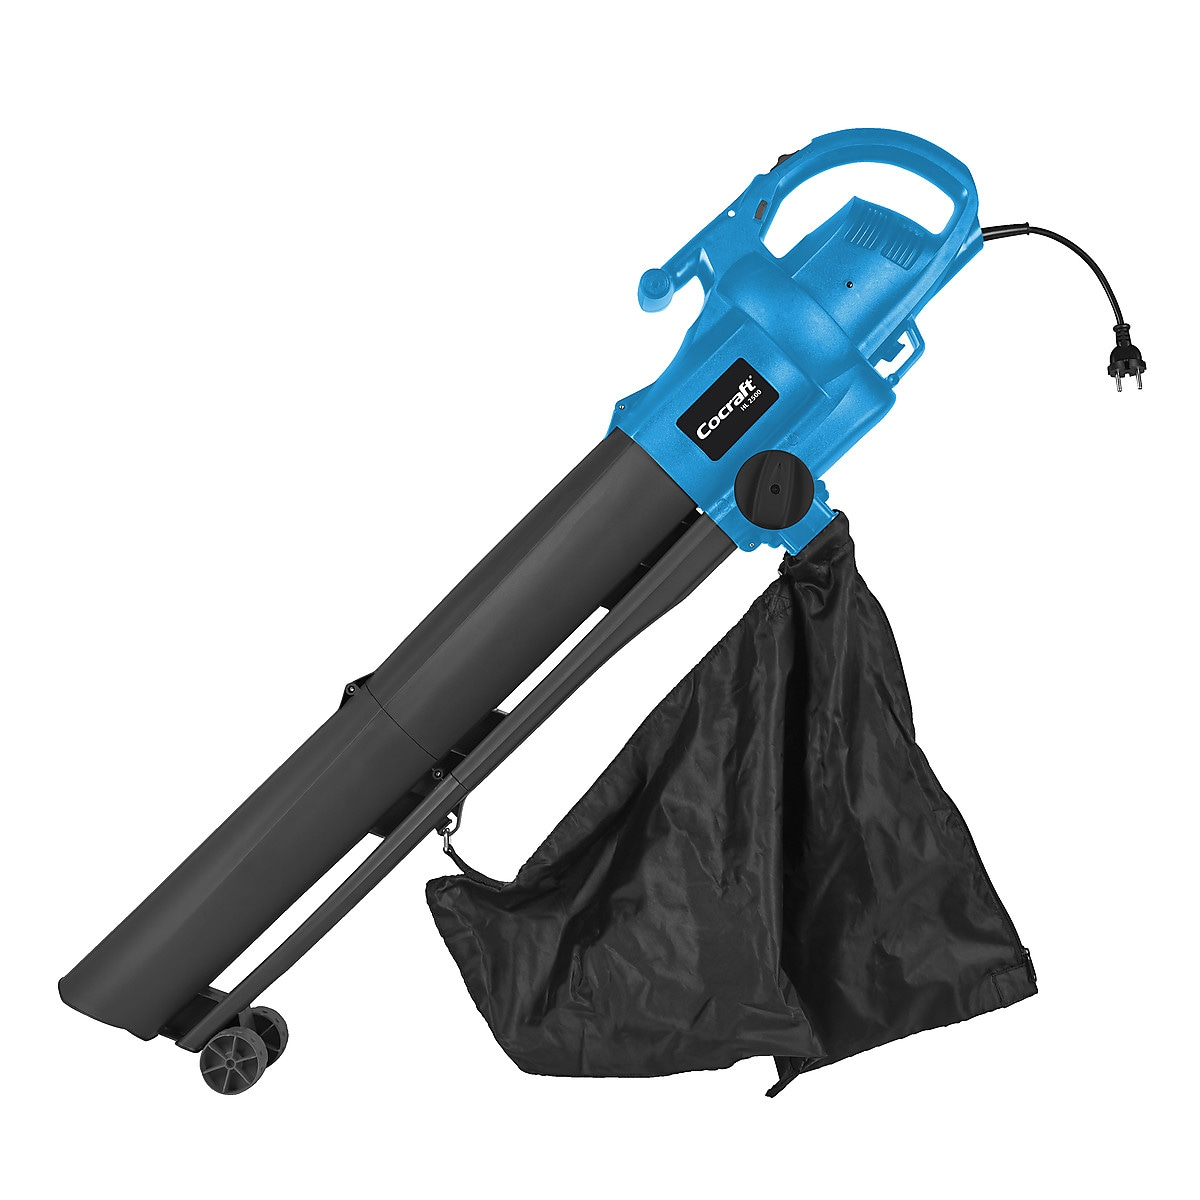 Cocraft HL 2500 Leaf Blower Vacuum